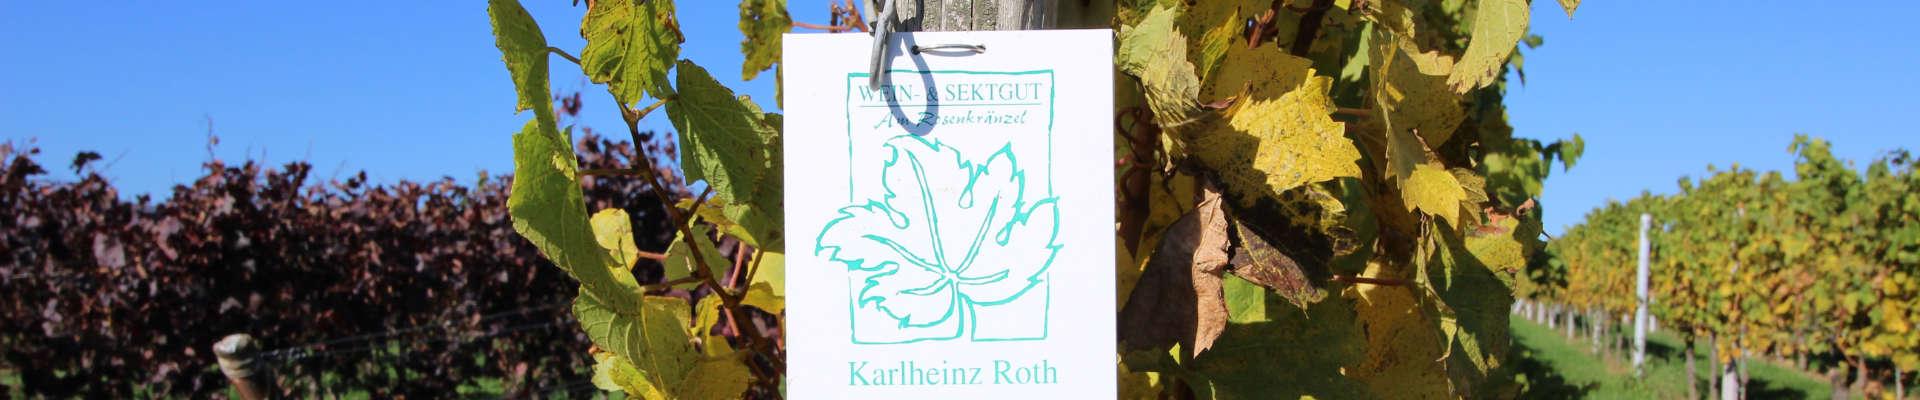 Wein- & Sektgut Karlheinz Roth